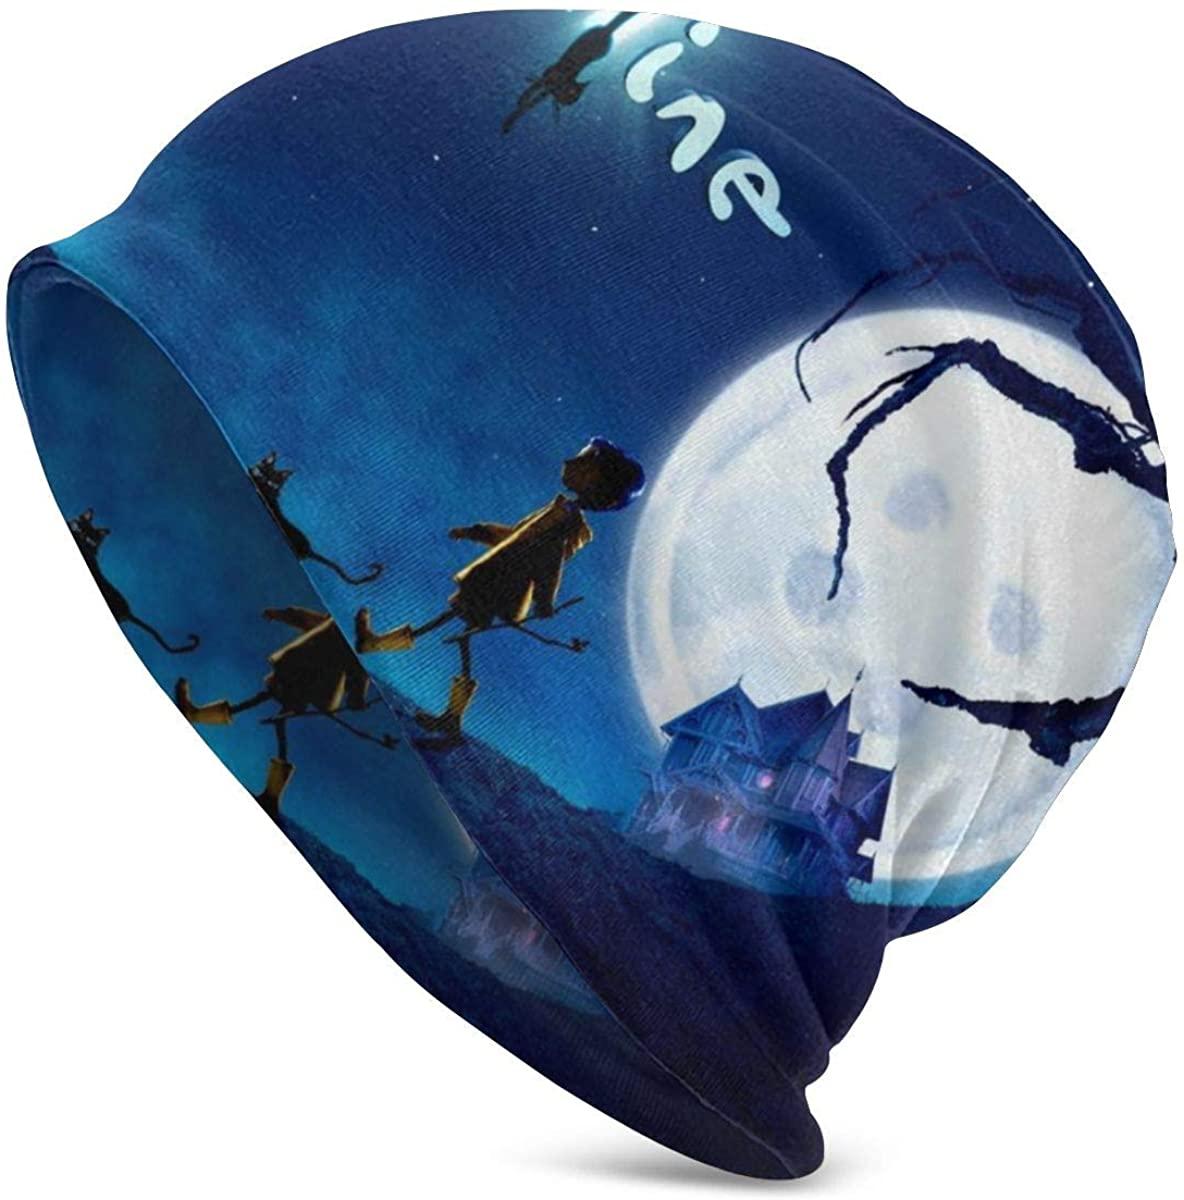 Dxddsdks Coraline Thin Unisex Adult Knit Hats Beanie Hat Winter Warm Printing Cap Black